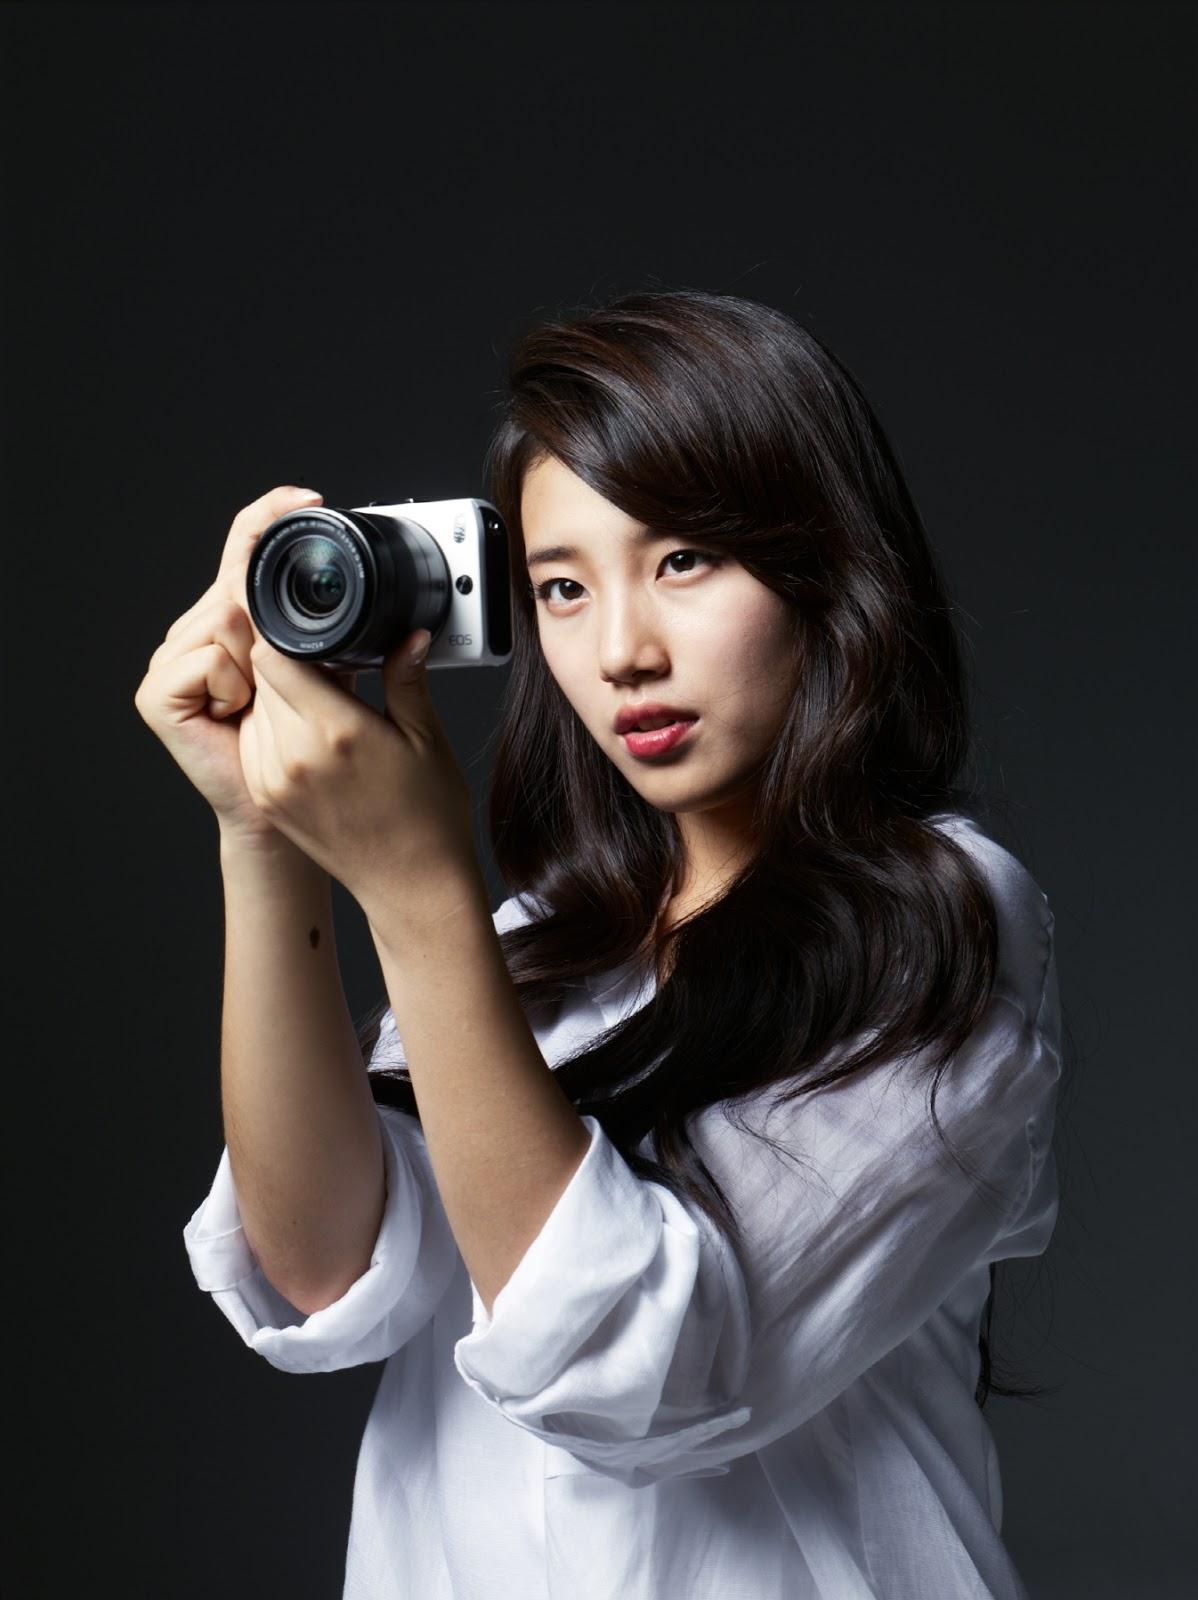 http://1.bp.blogspot.com/-ooakMaeJPgM/UV1JJFYwi1I/AAAAAAAAiO0/CN09wHdLsNE/s1600/Miss-A-Suzy-%EC%88%98%EC%A7%80-Canon-photos-14.jpg